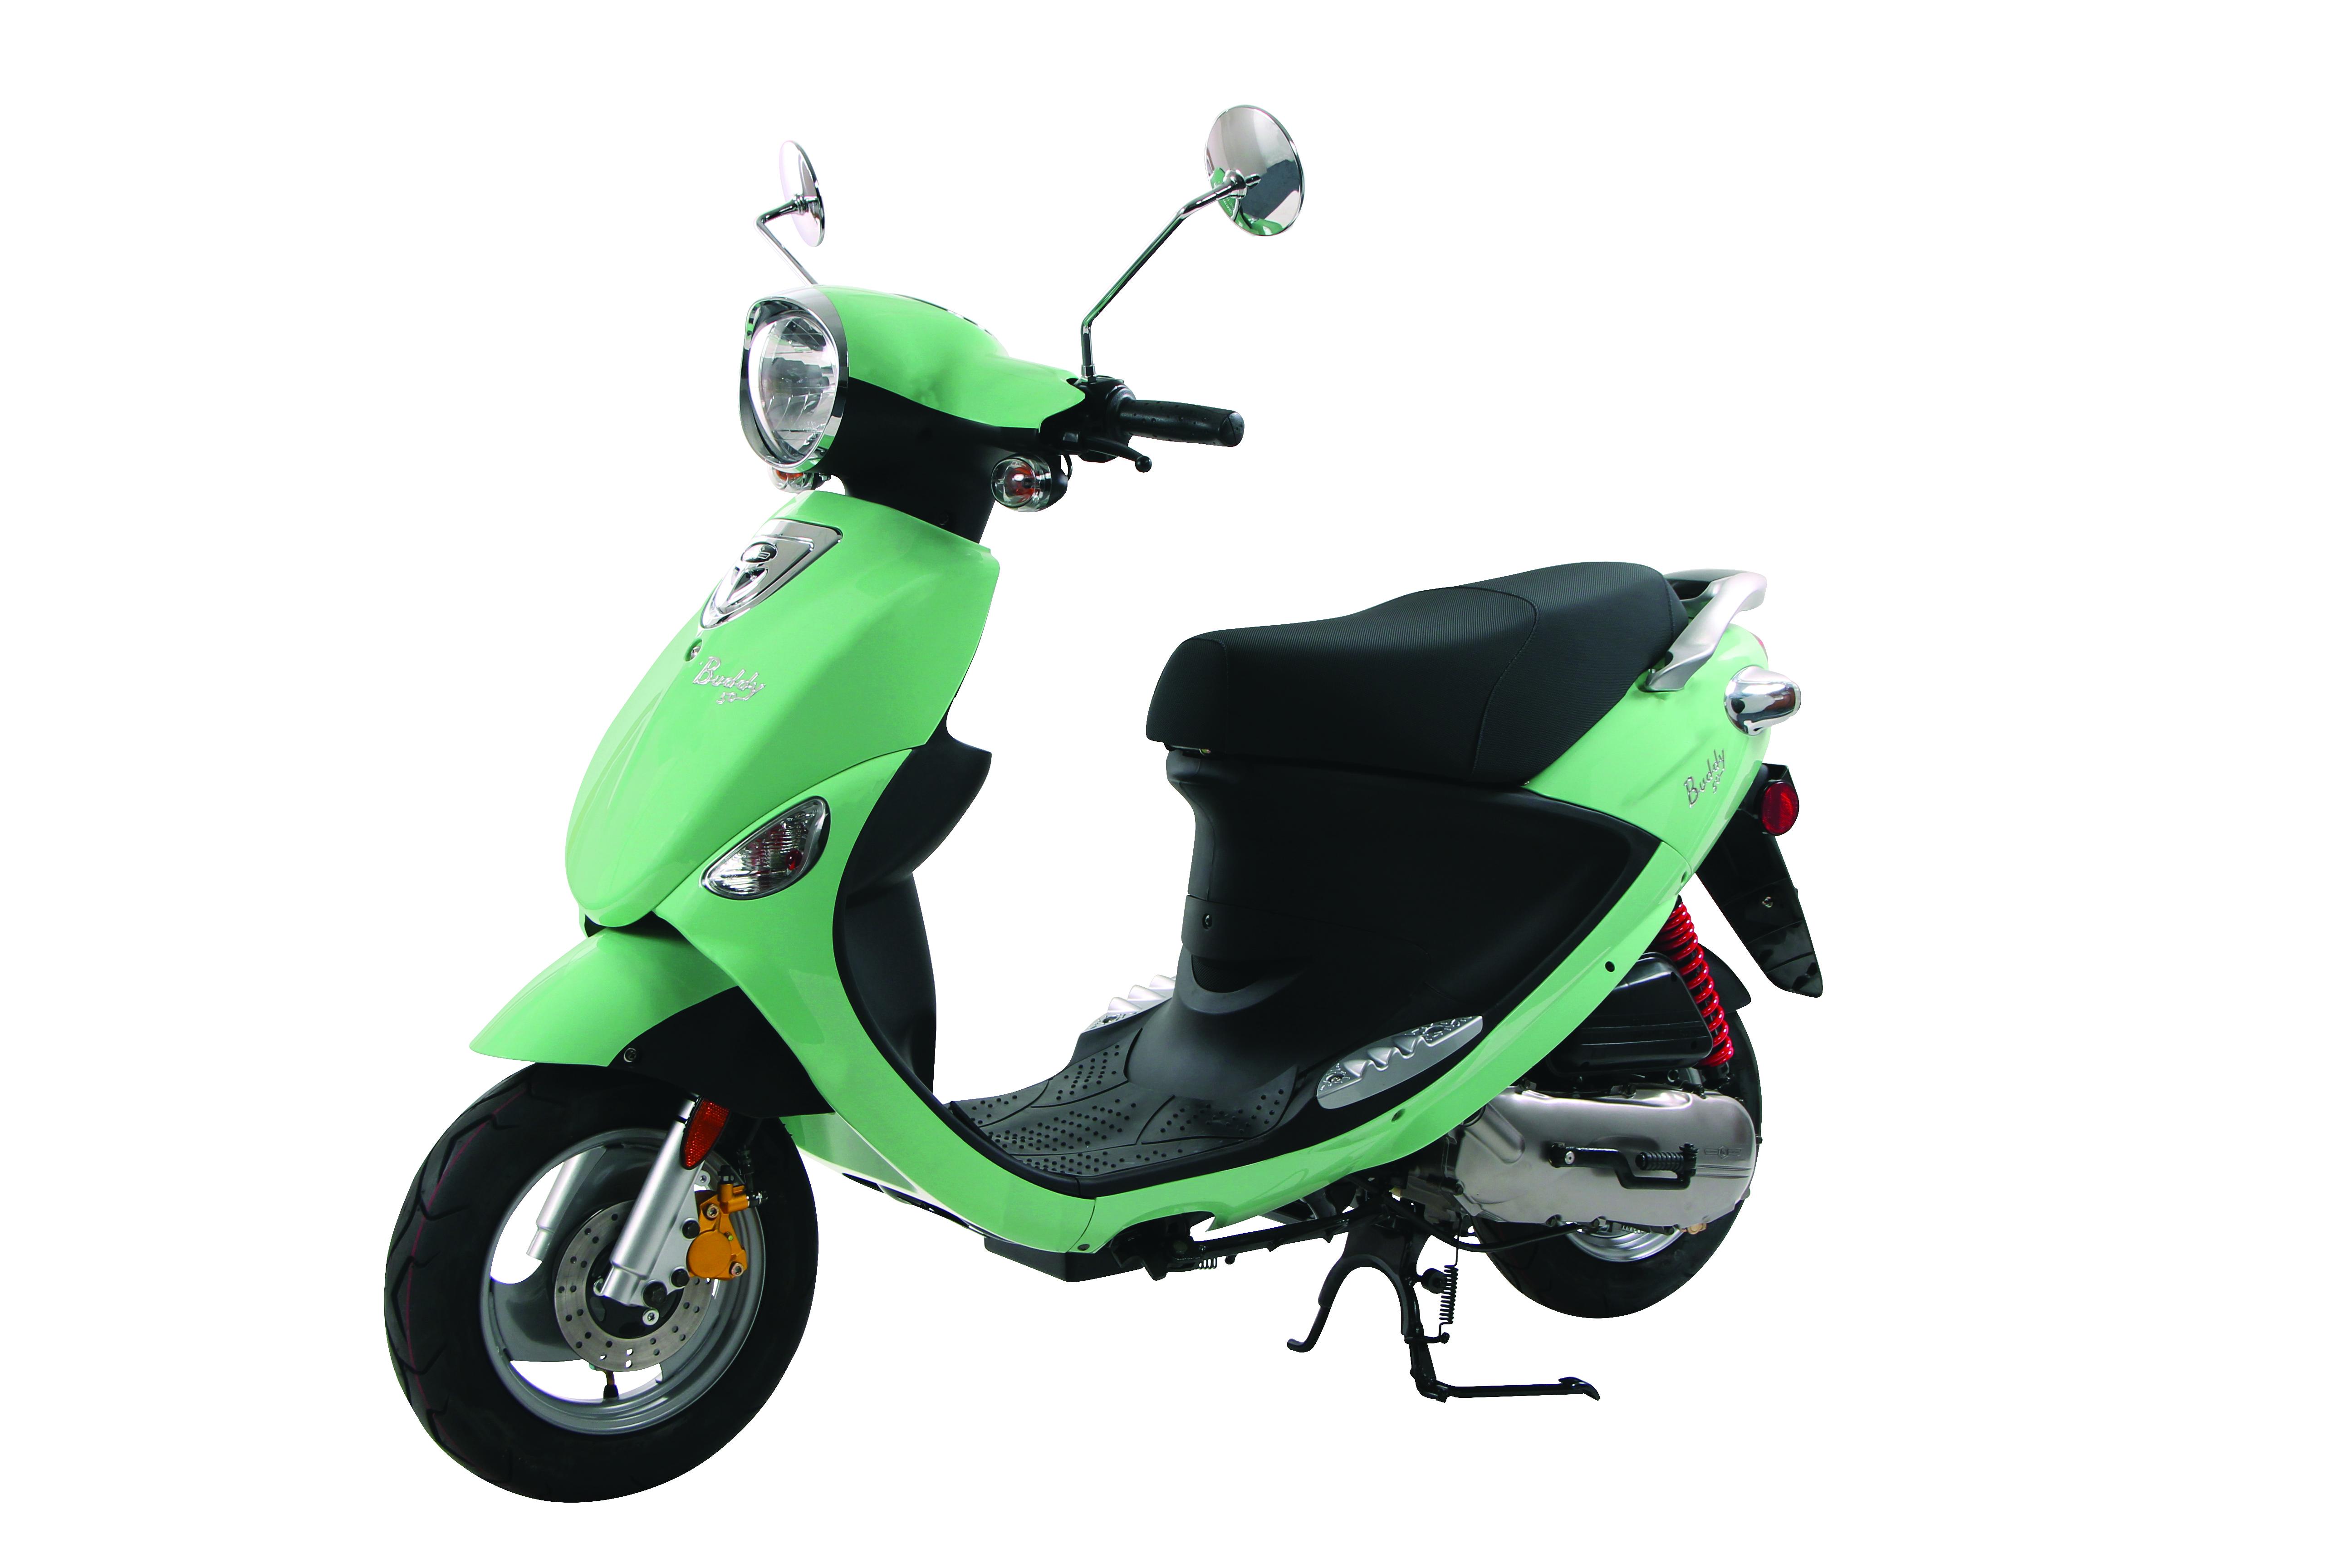 Green Genuine Buddy 50